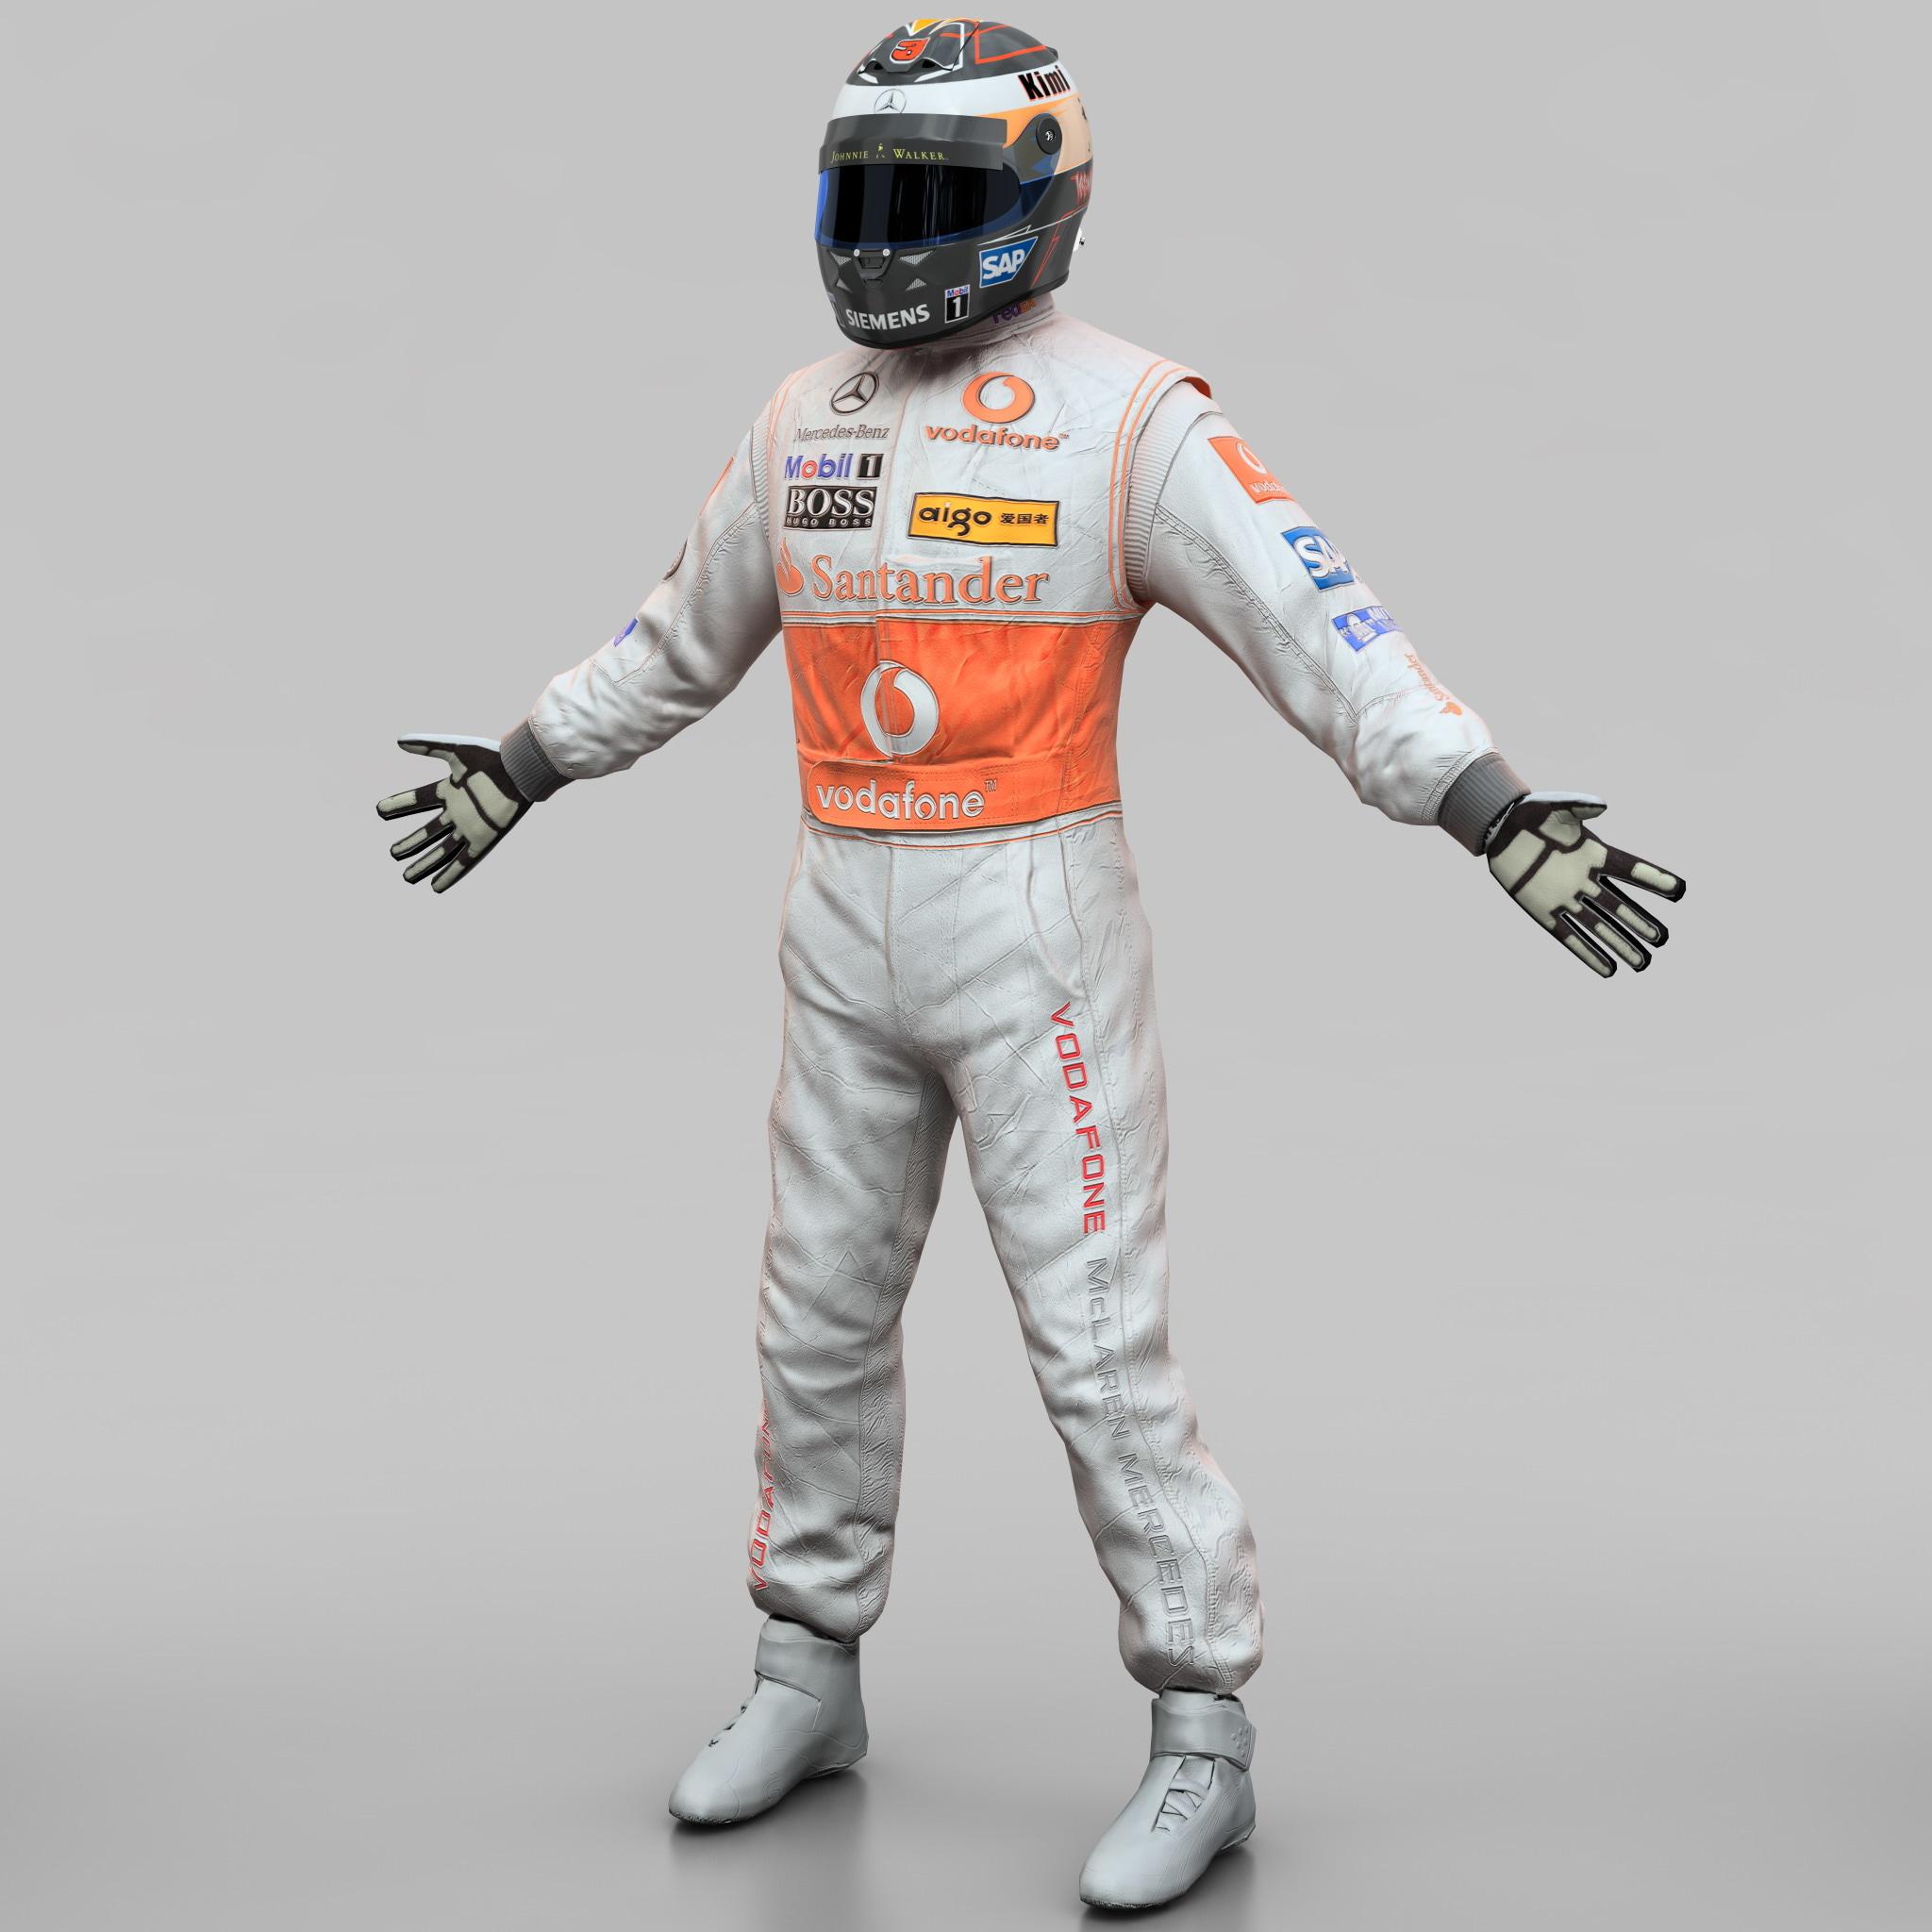 306566_Racing_Driver_Mercedes_001.jpg